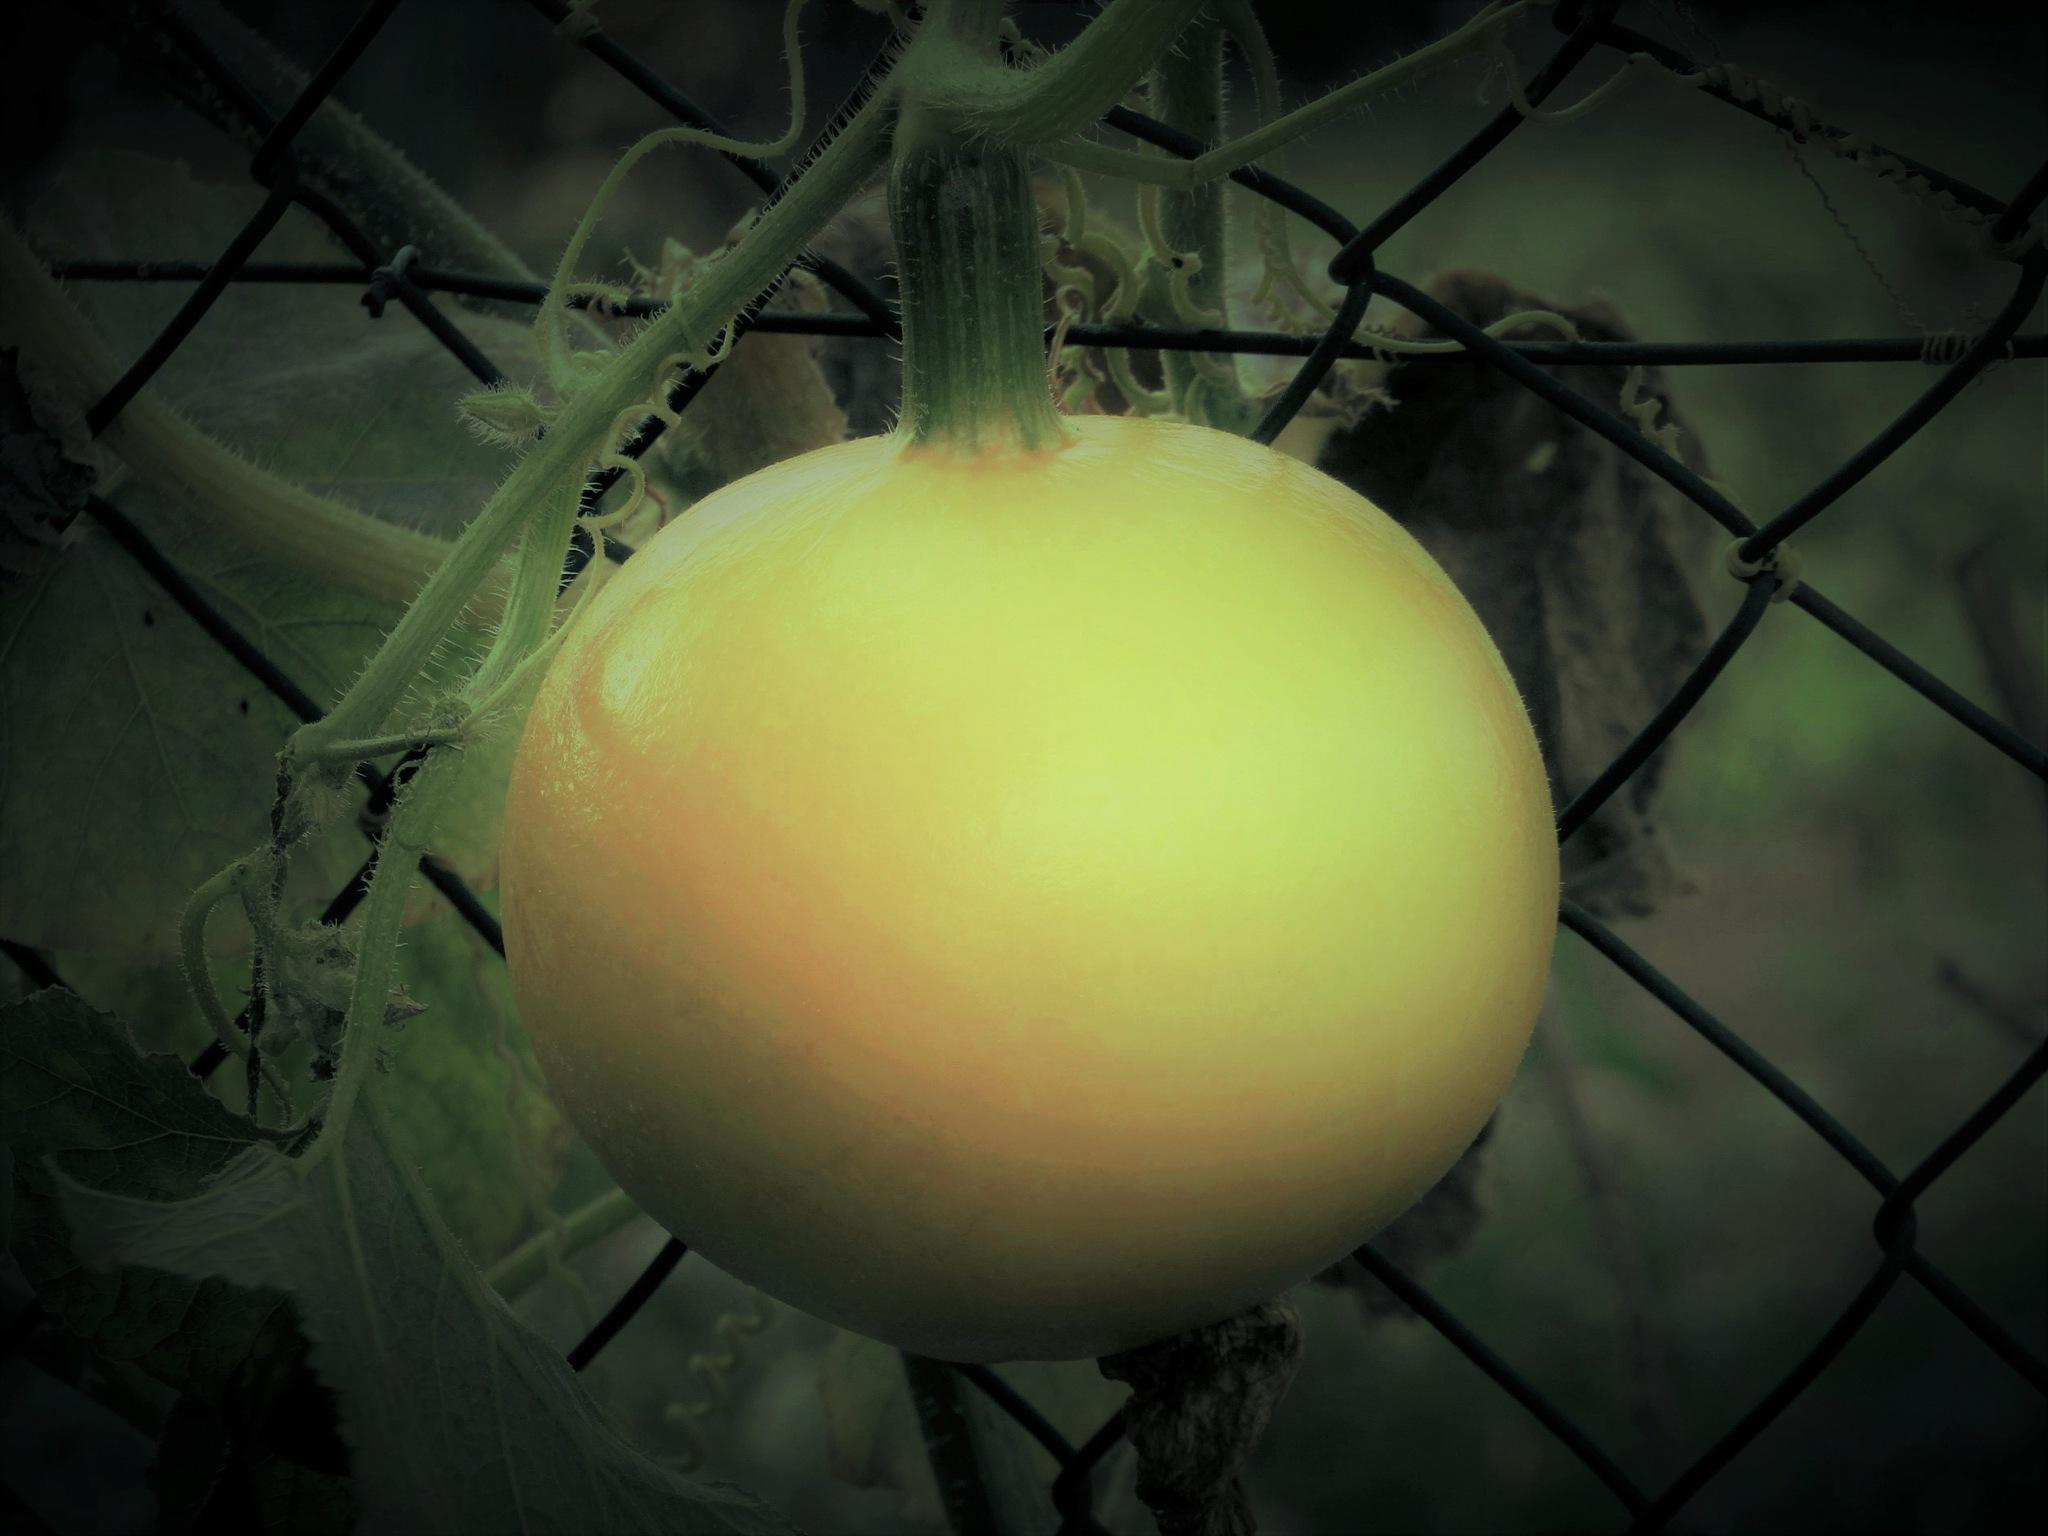 tomate by catherinevigili